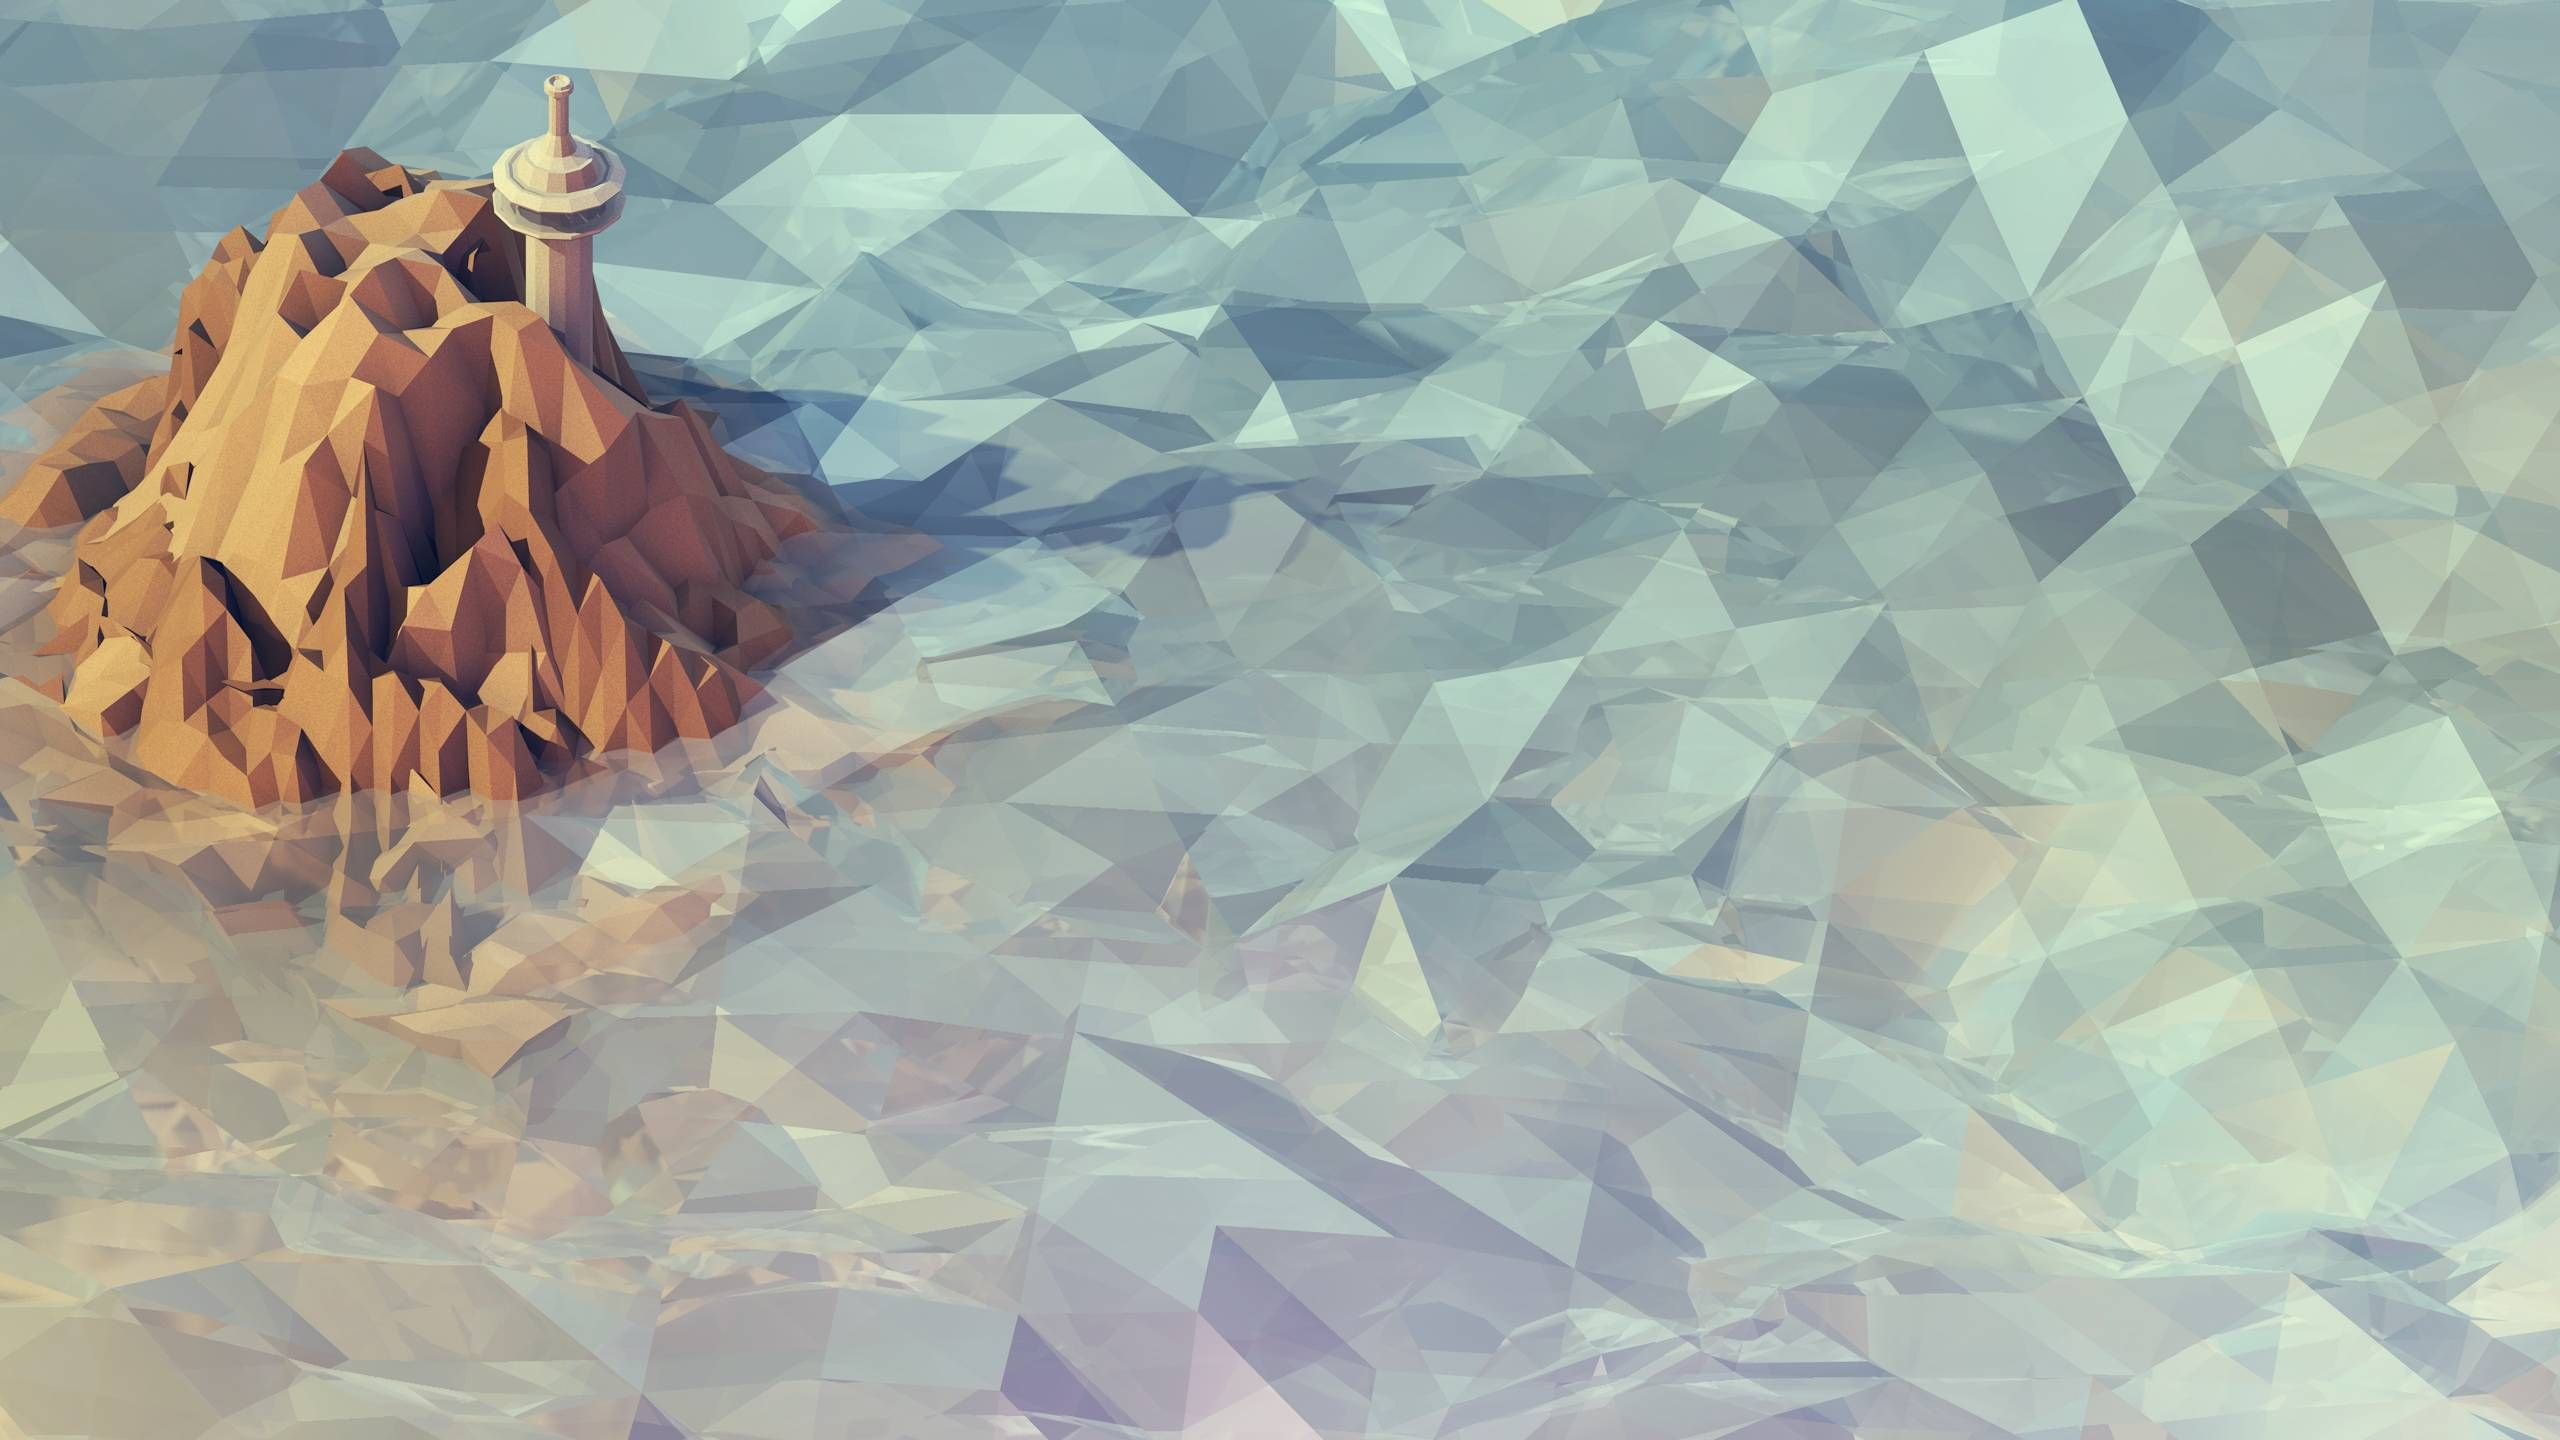 Pin By Mario Gonzalez On Rikey Polygon Art Low Poly Art Wallpaper Project